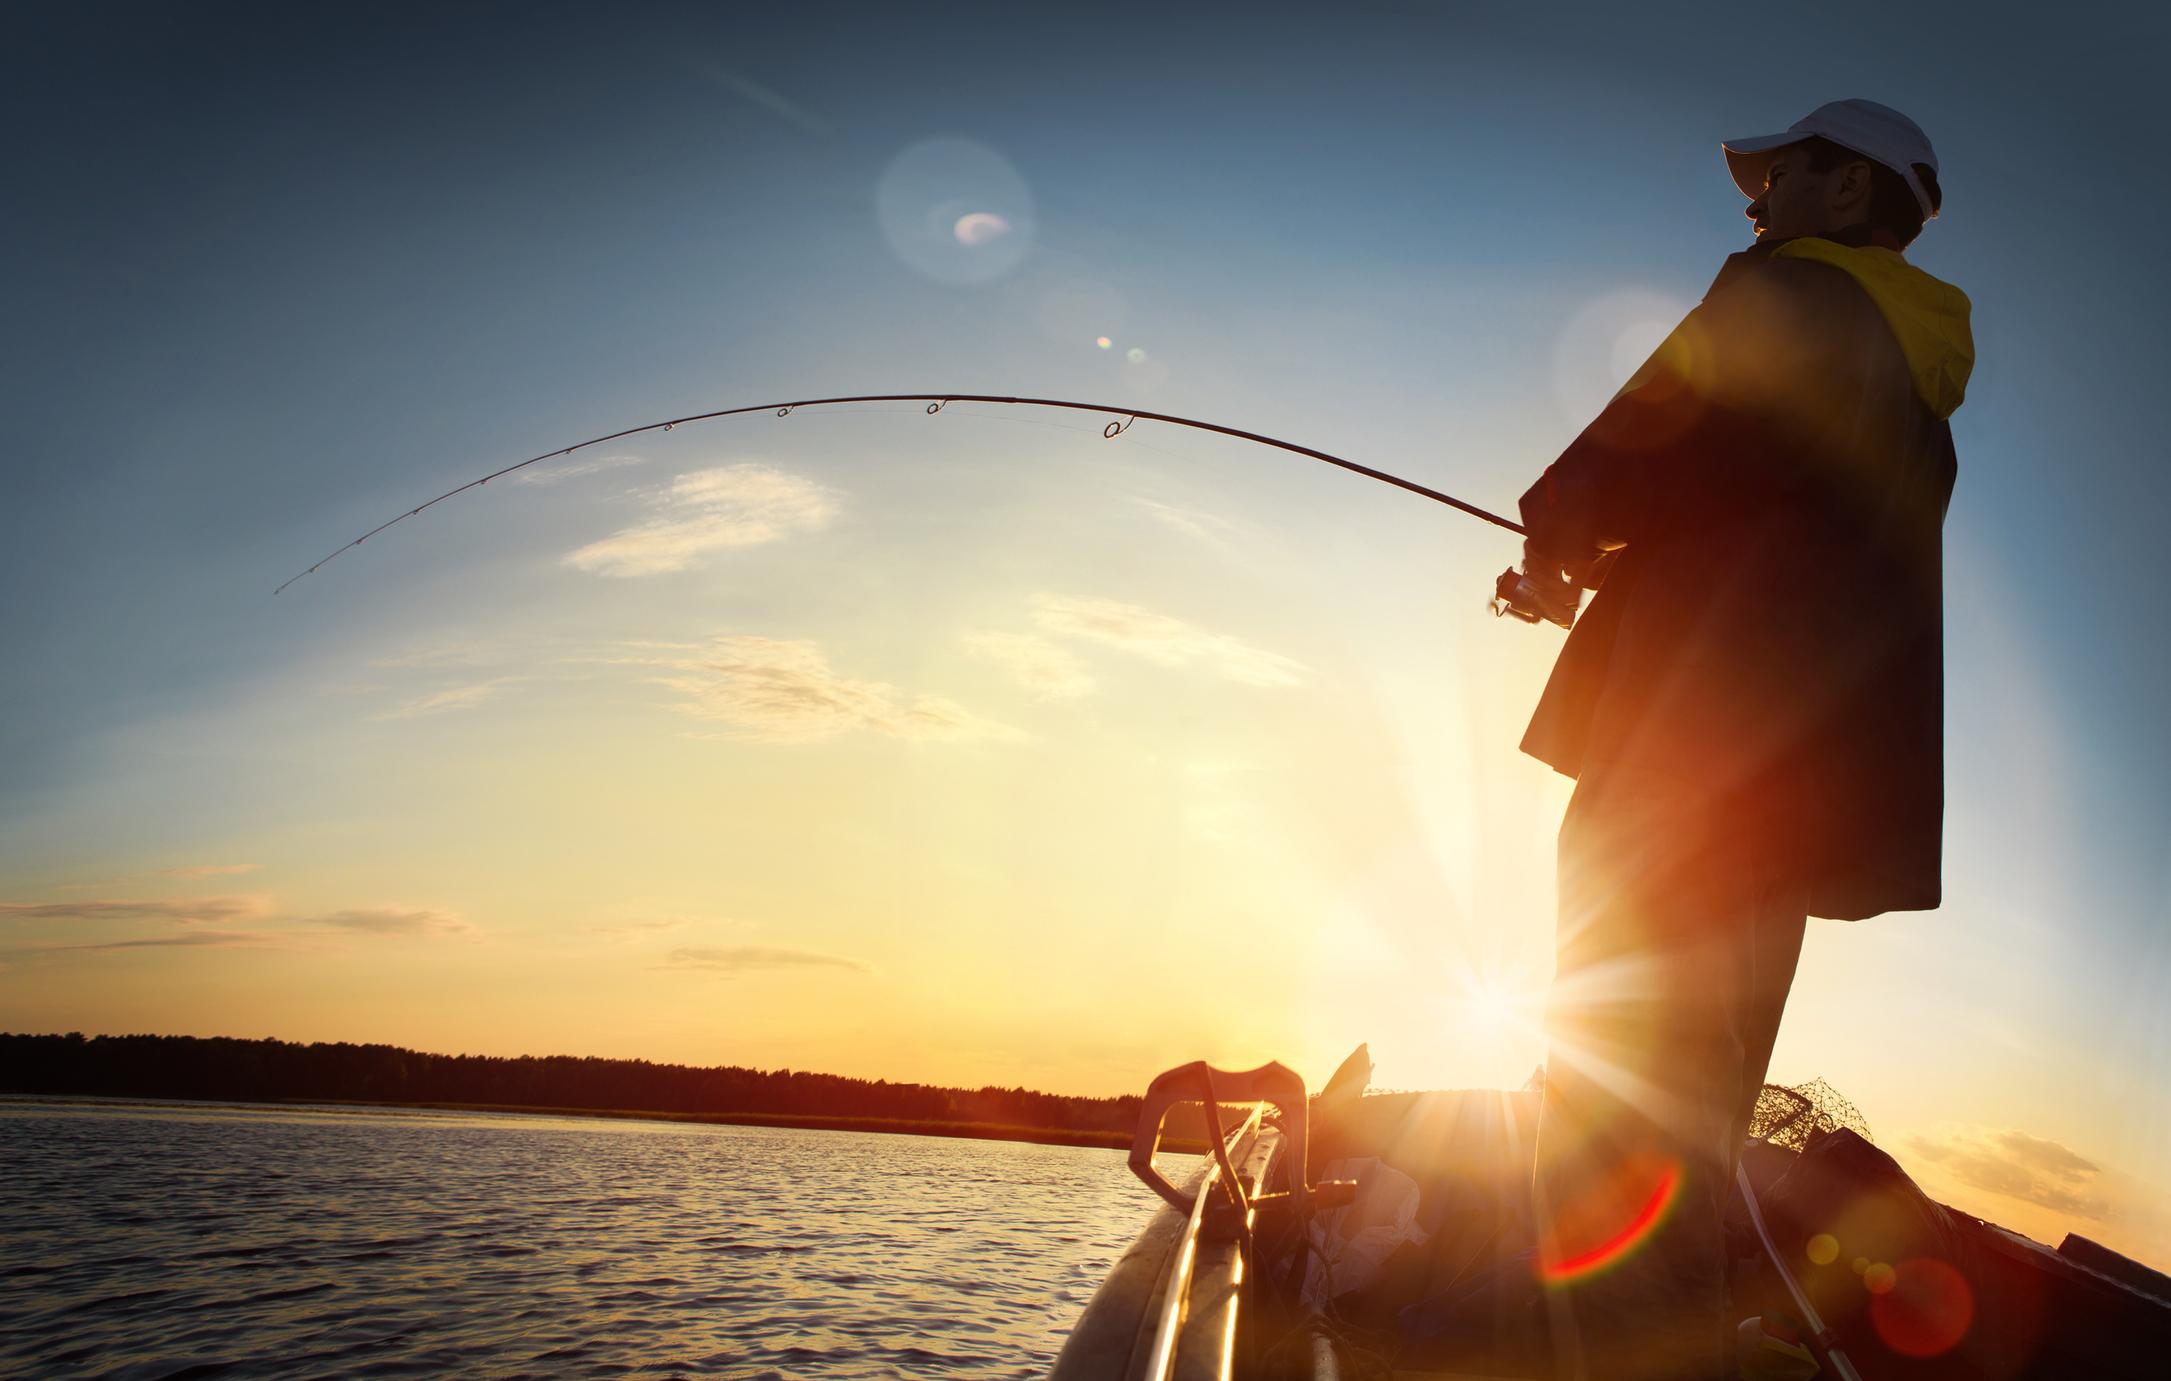 Fishing Boat at Sunrise